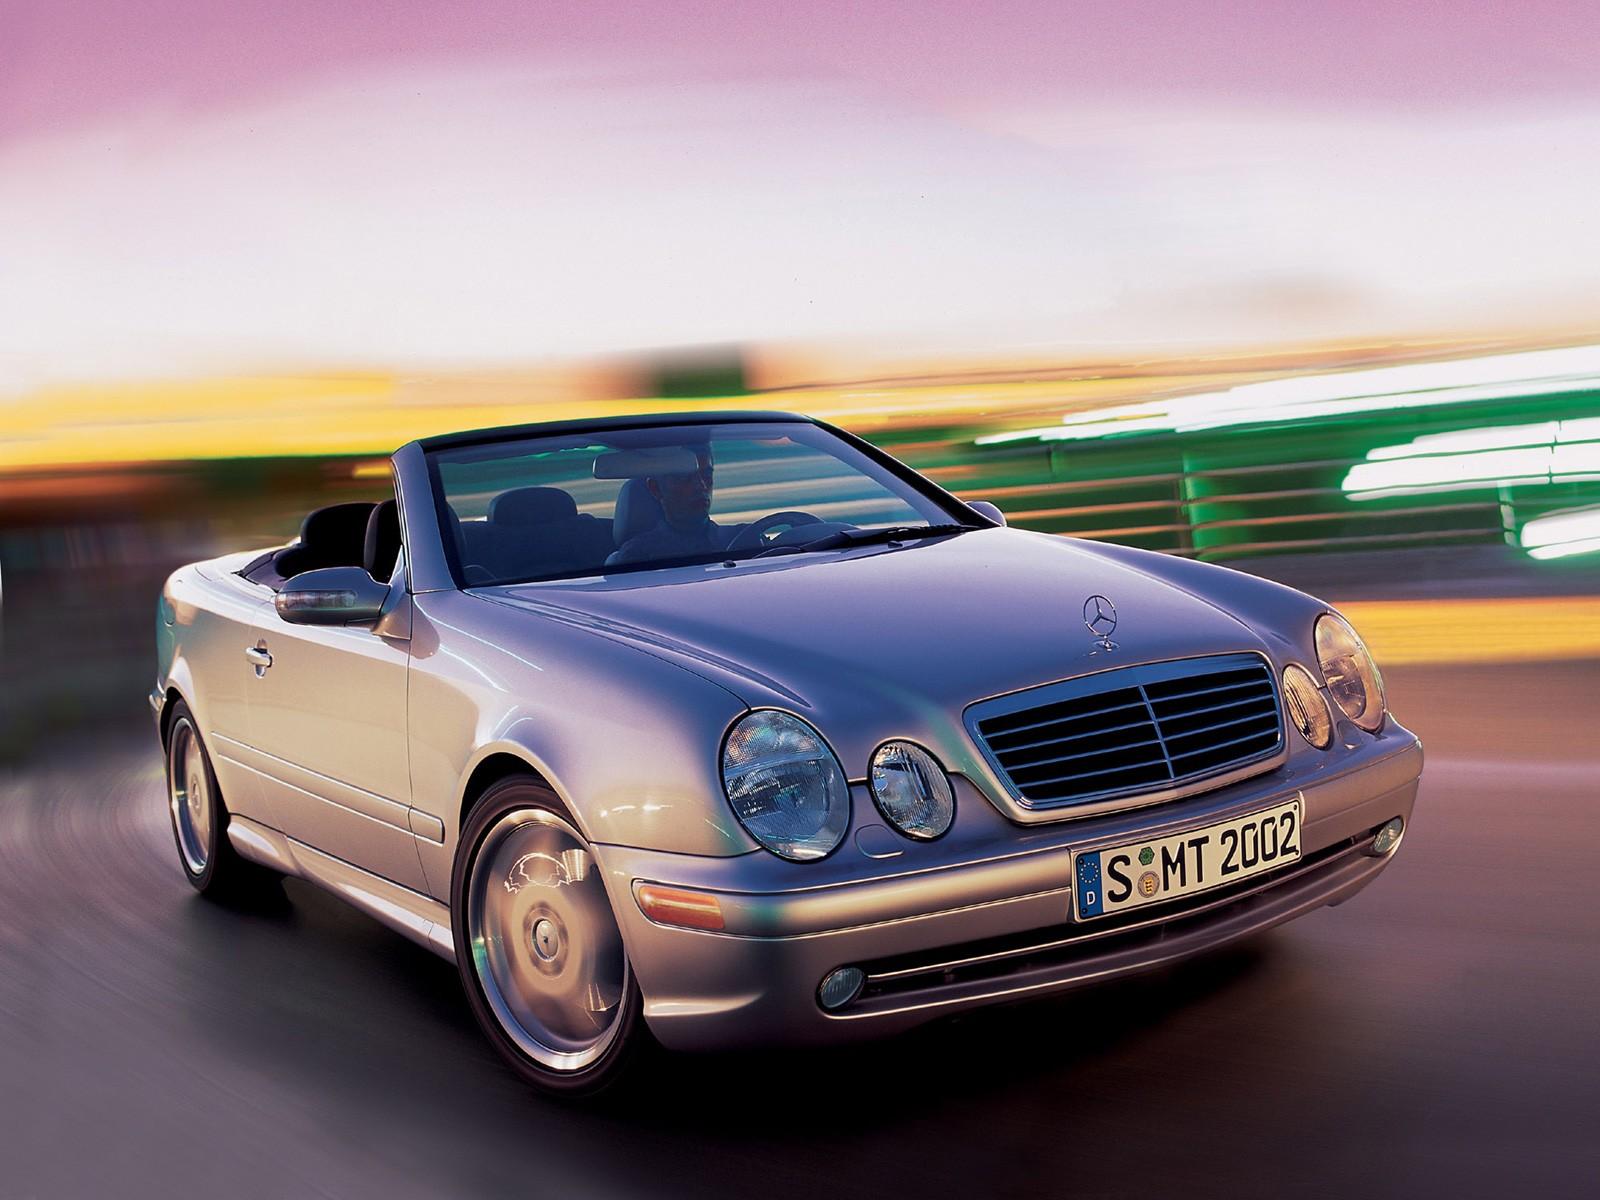 mercedes benz clk 55 amg cabrio a208 specs 1999 2000 2001 2002 2003 autoevolution. Black Bedroom Furniture Sets. Home Design Ideas